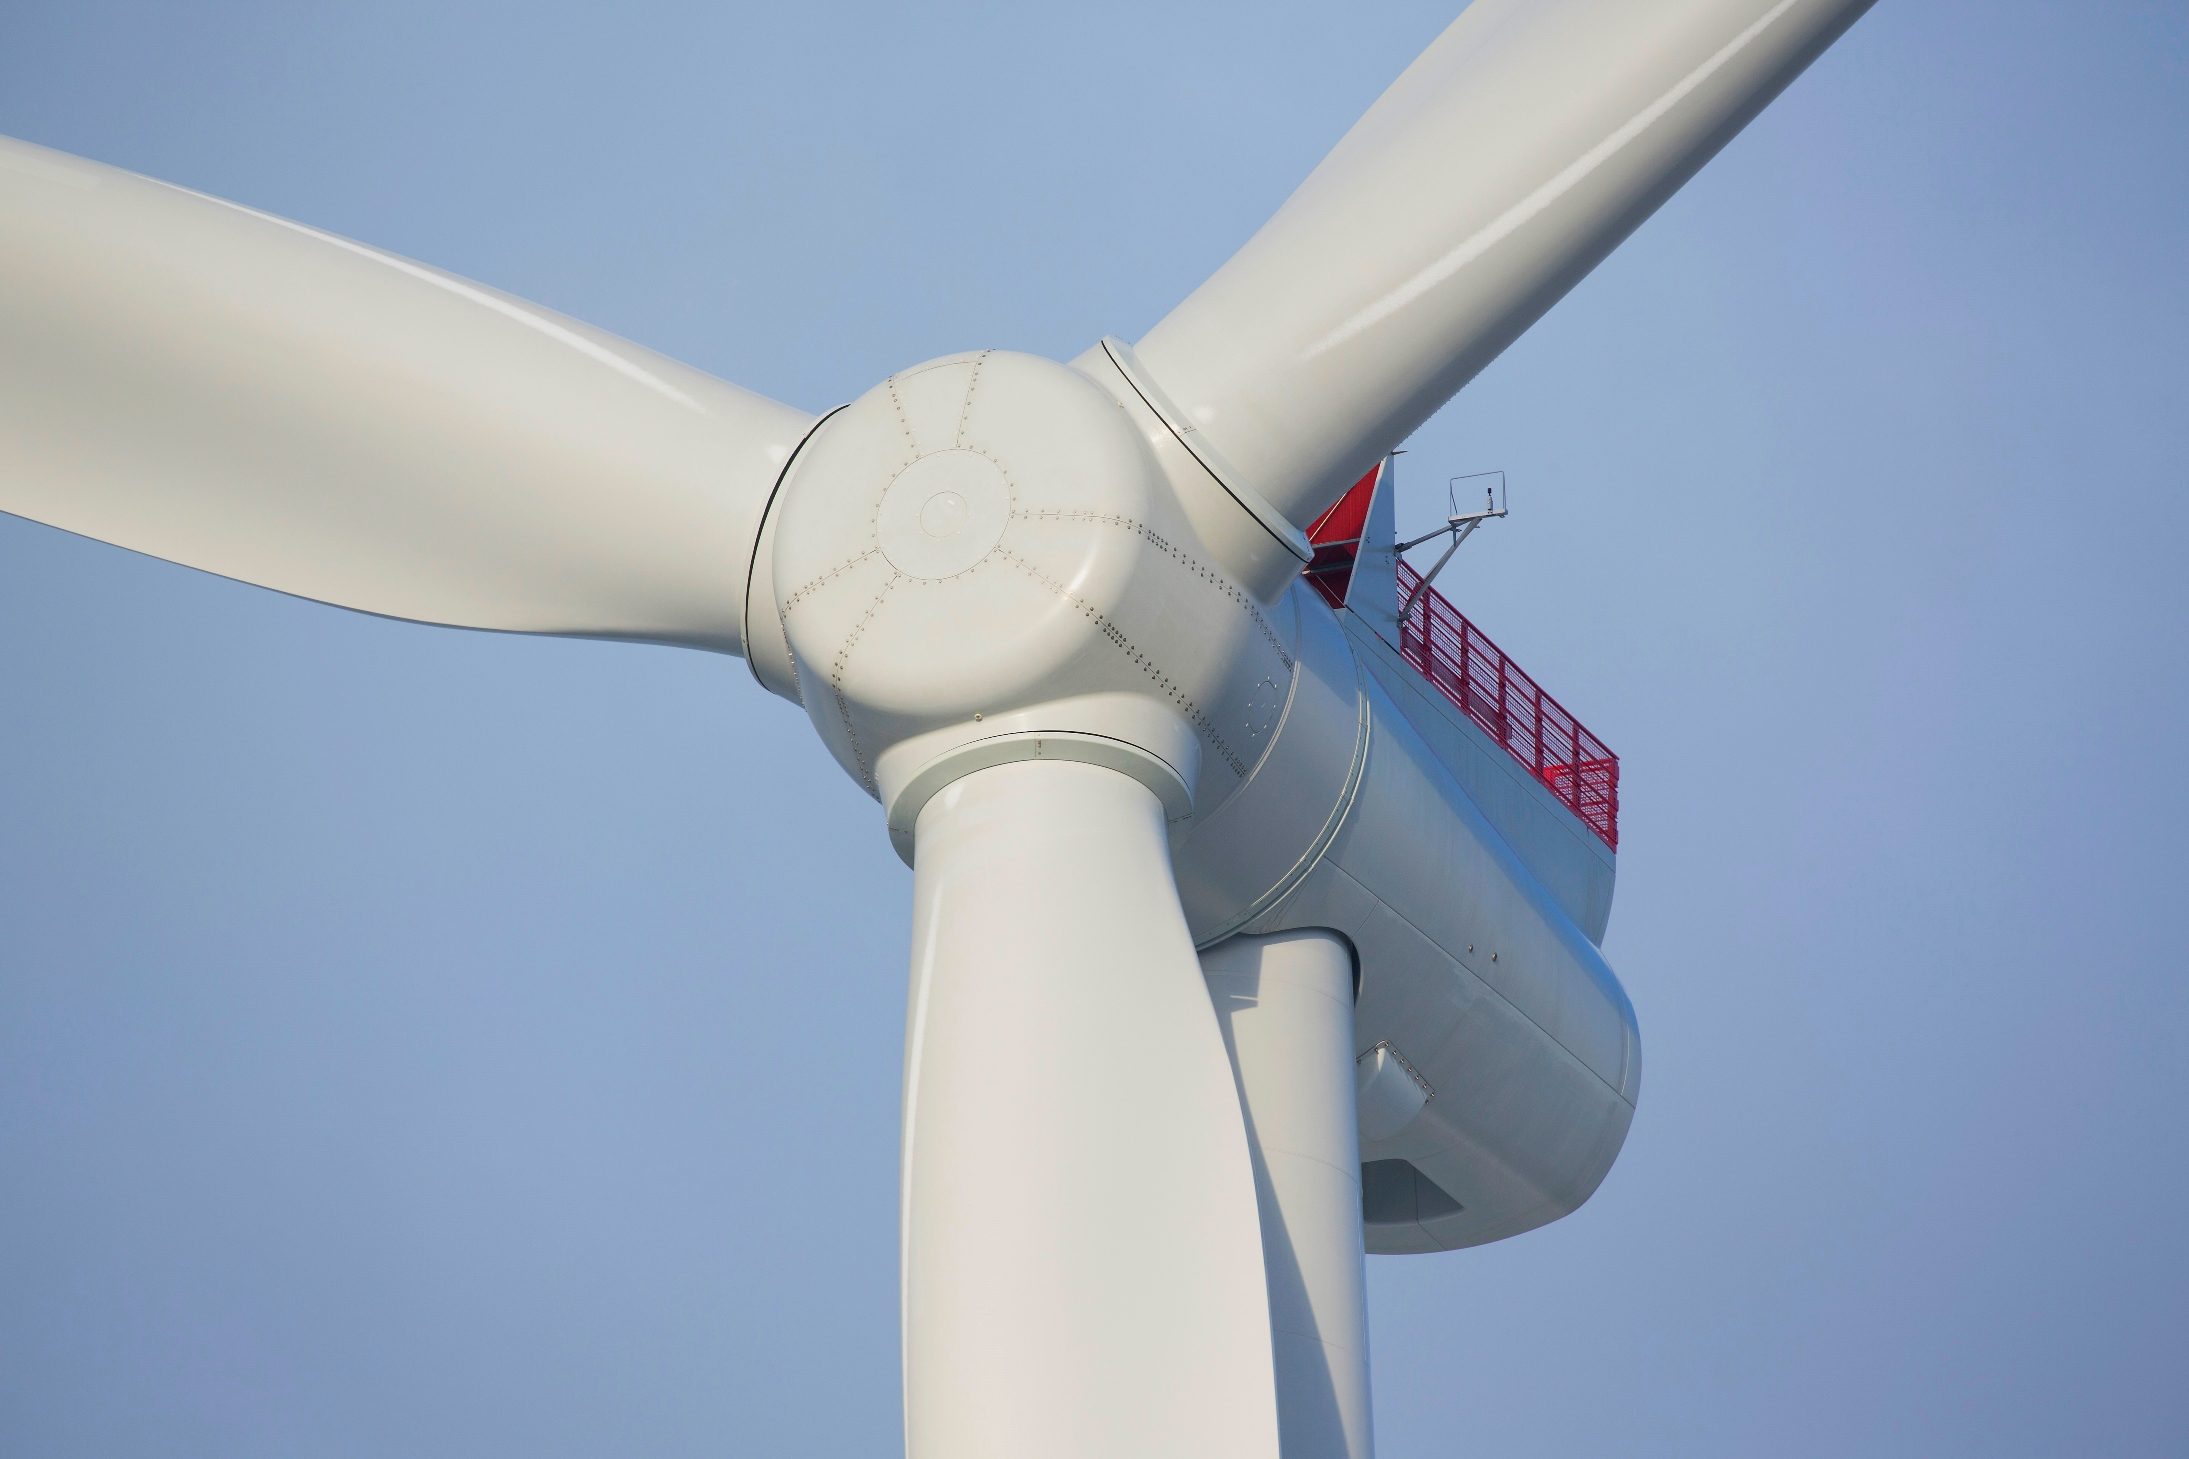 siemens-gamesa-renewables-offshore-turbine-8-mw_low_res